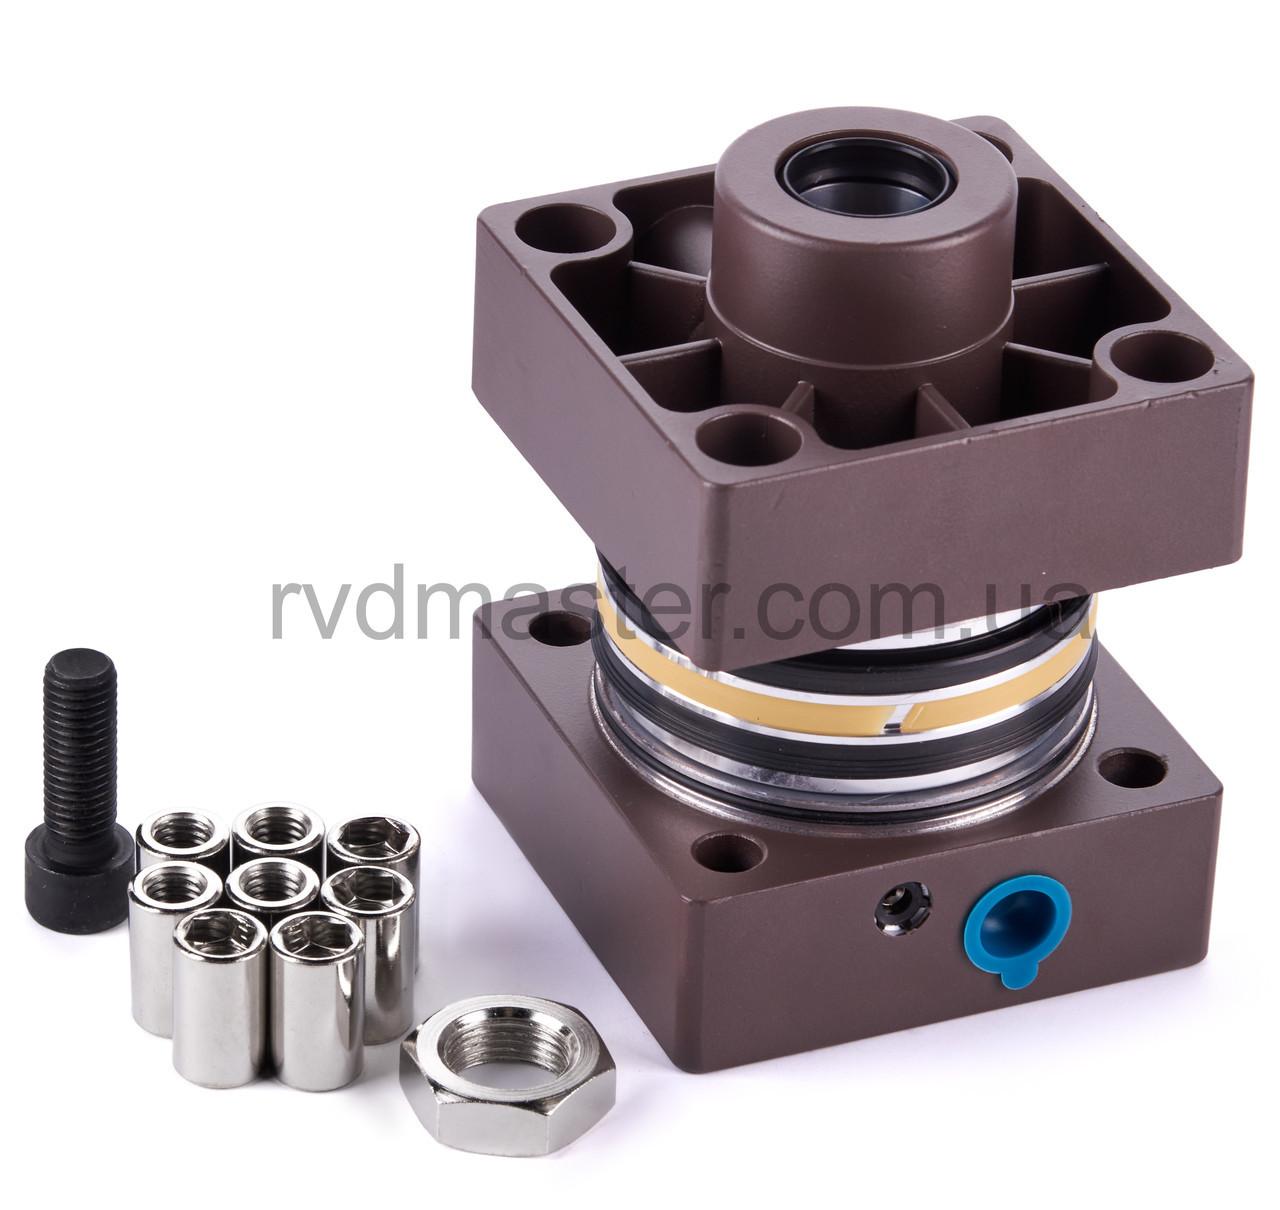 Комплект для сборки пневматического цилиндра диаметром поршня 40mm